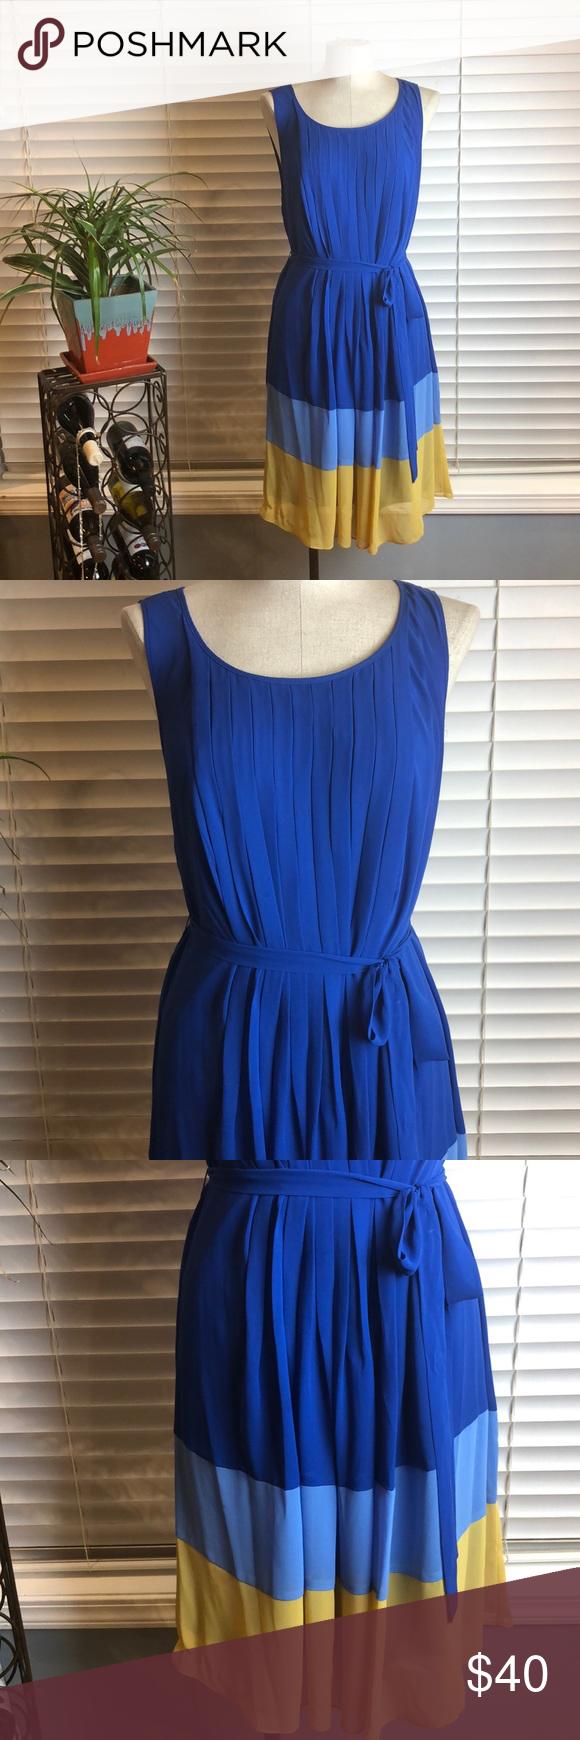 Pin By Raanaz Pasandideh On Plus Size Tiered Maxi Dress Maxi Dress Plus Size Outfits [ 1599 x 1200 Pixel ]